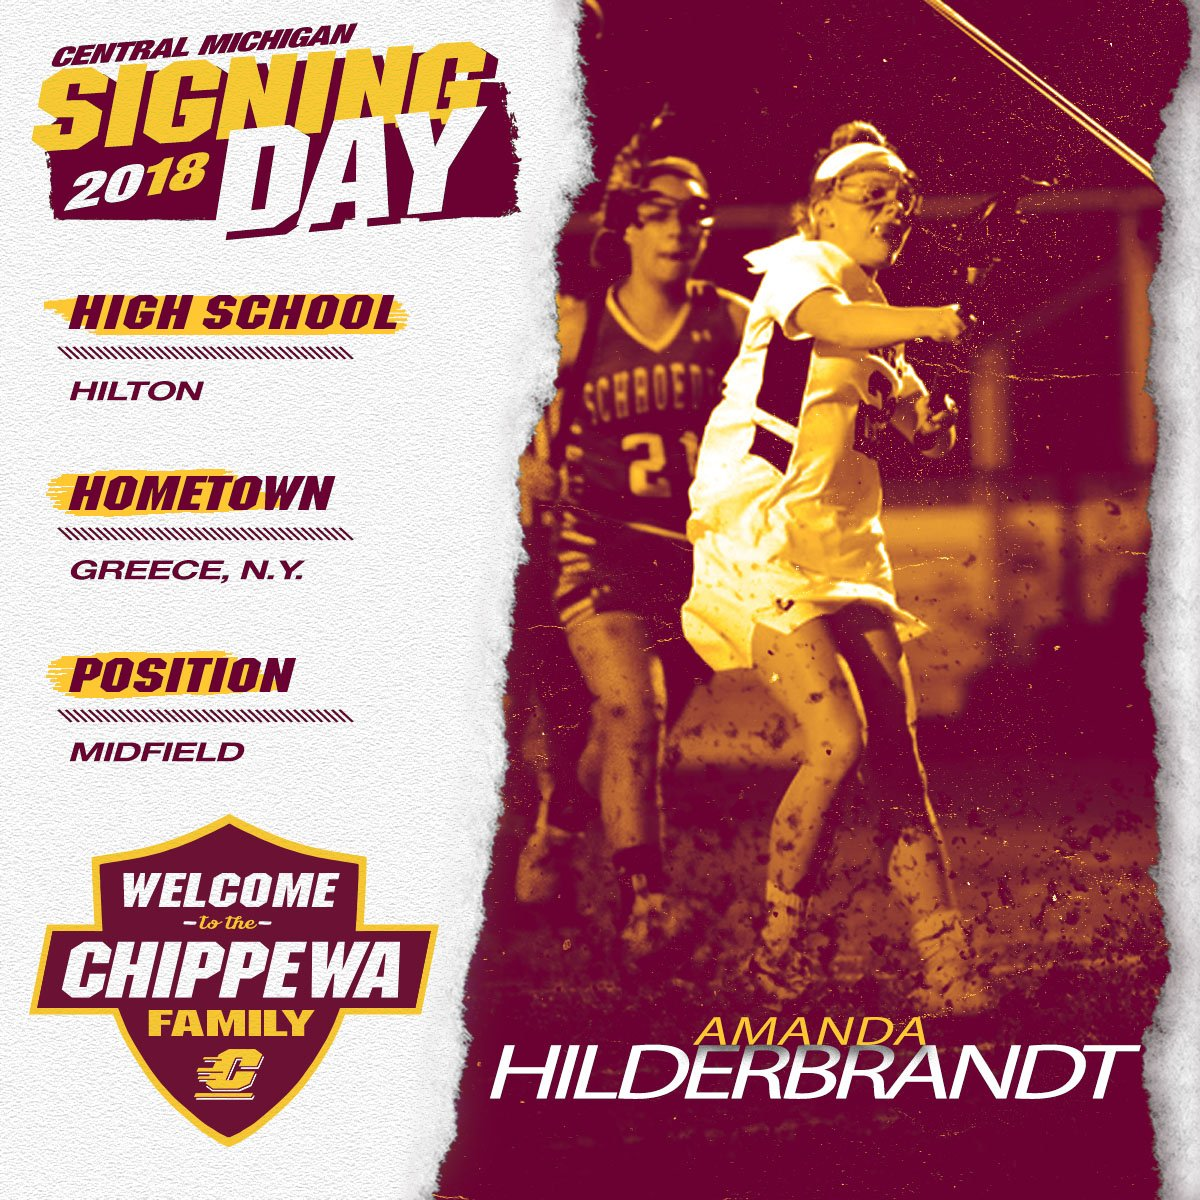 Welcome to the Chippewa family, Amanda Hilderbrandt! #FireUpChips 🔥⬆️🥍